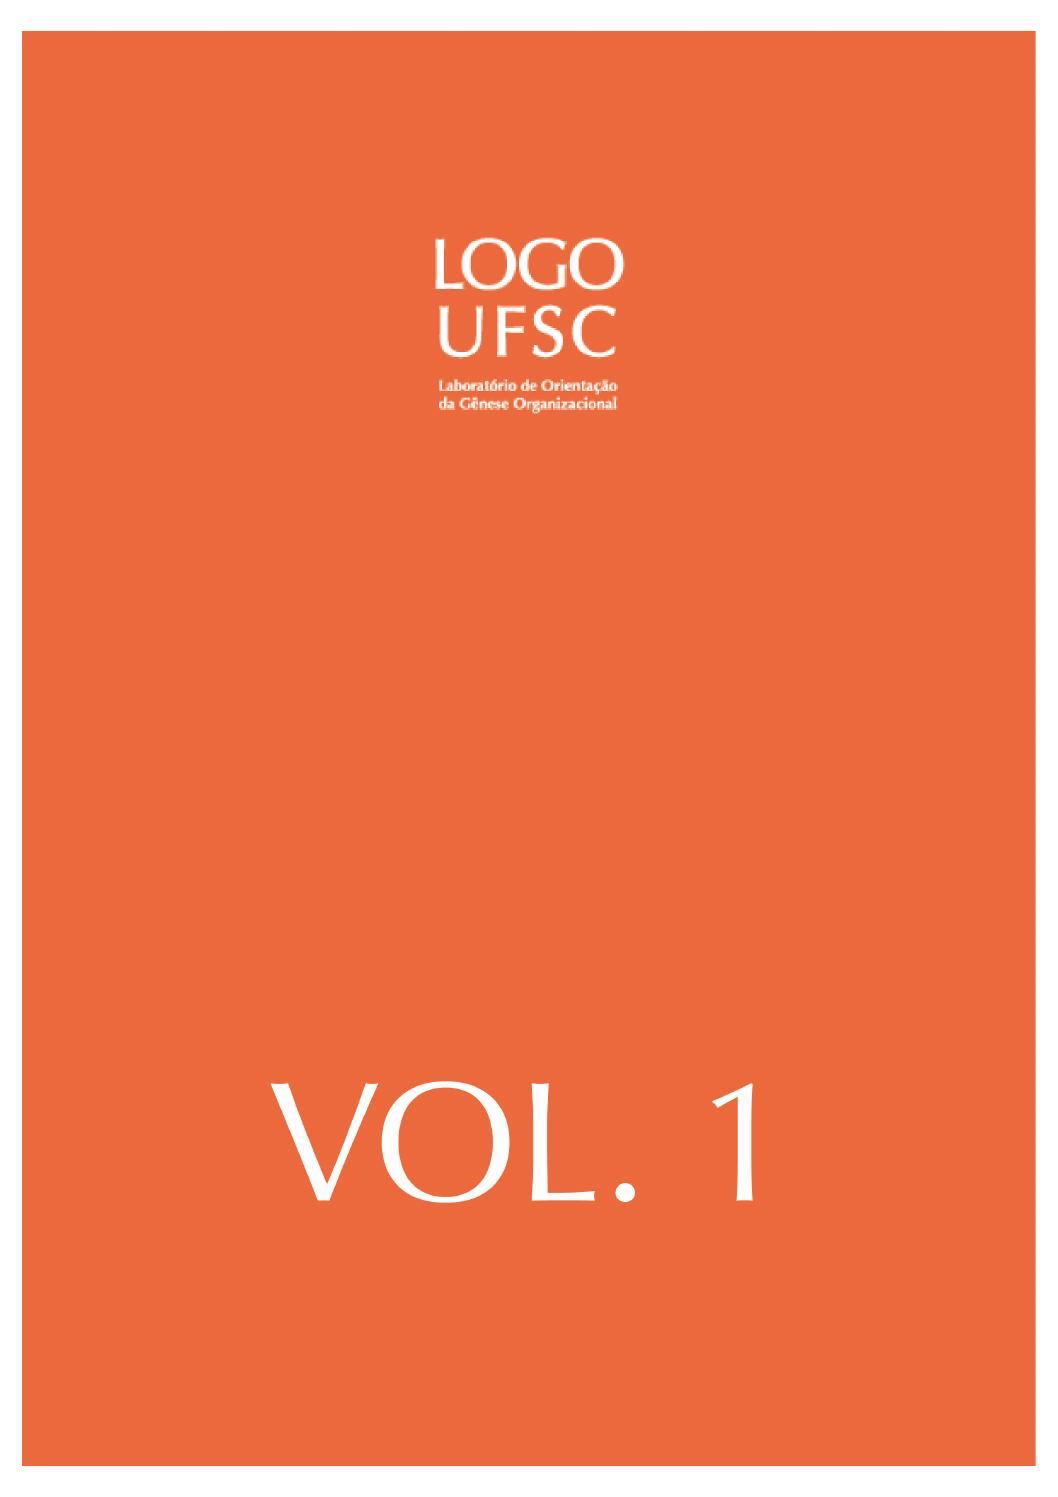 Revista Vol. 1 by LOGO UFSC - issuu 283d818f4eafc